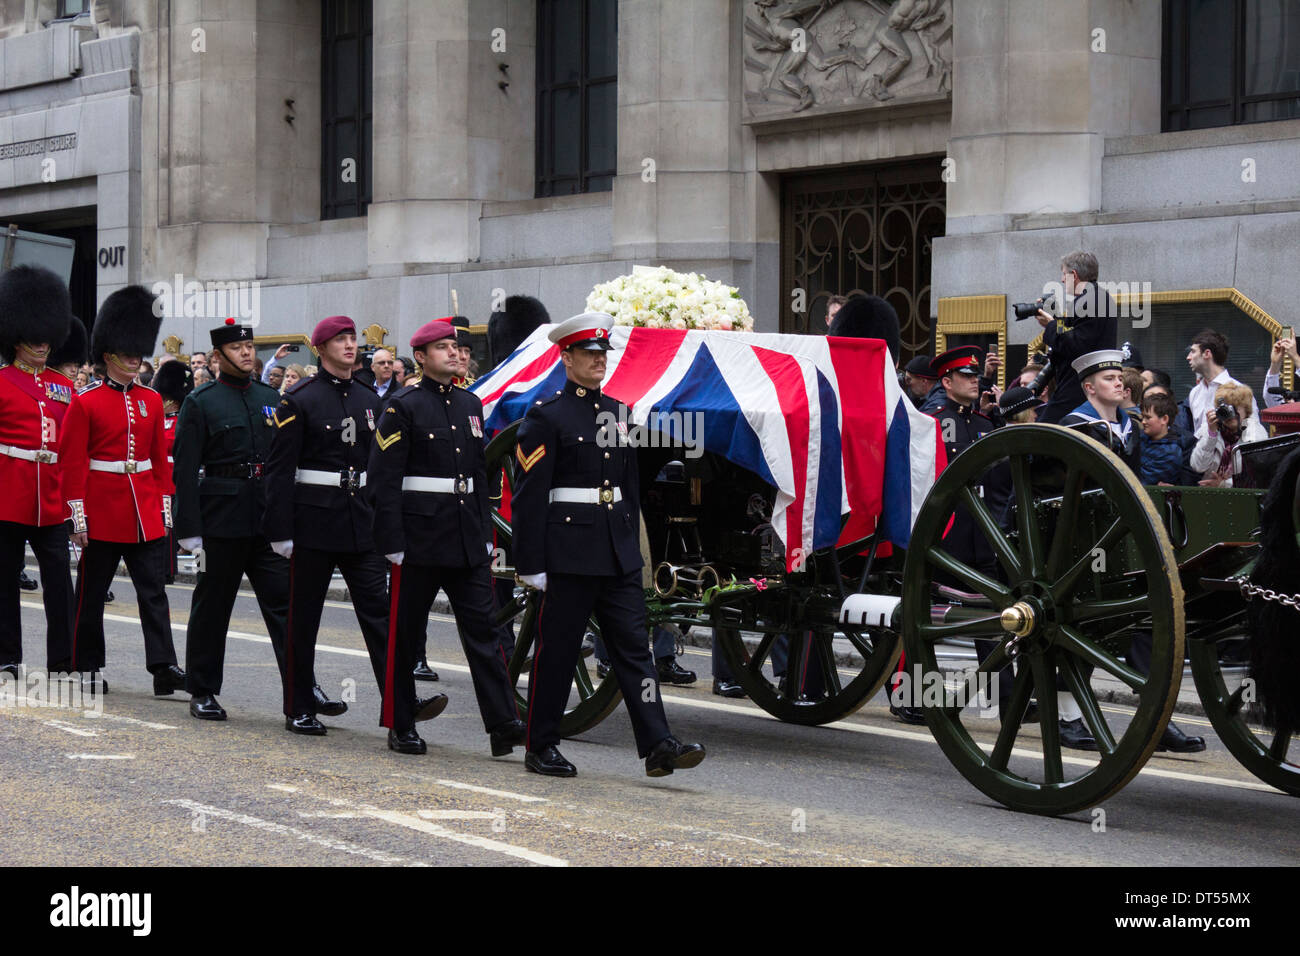 Margaret Thatcher's state funeral proceeding along Fleet Street, London, England, UK - Stock Image